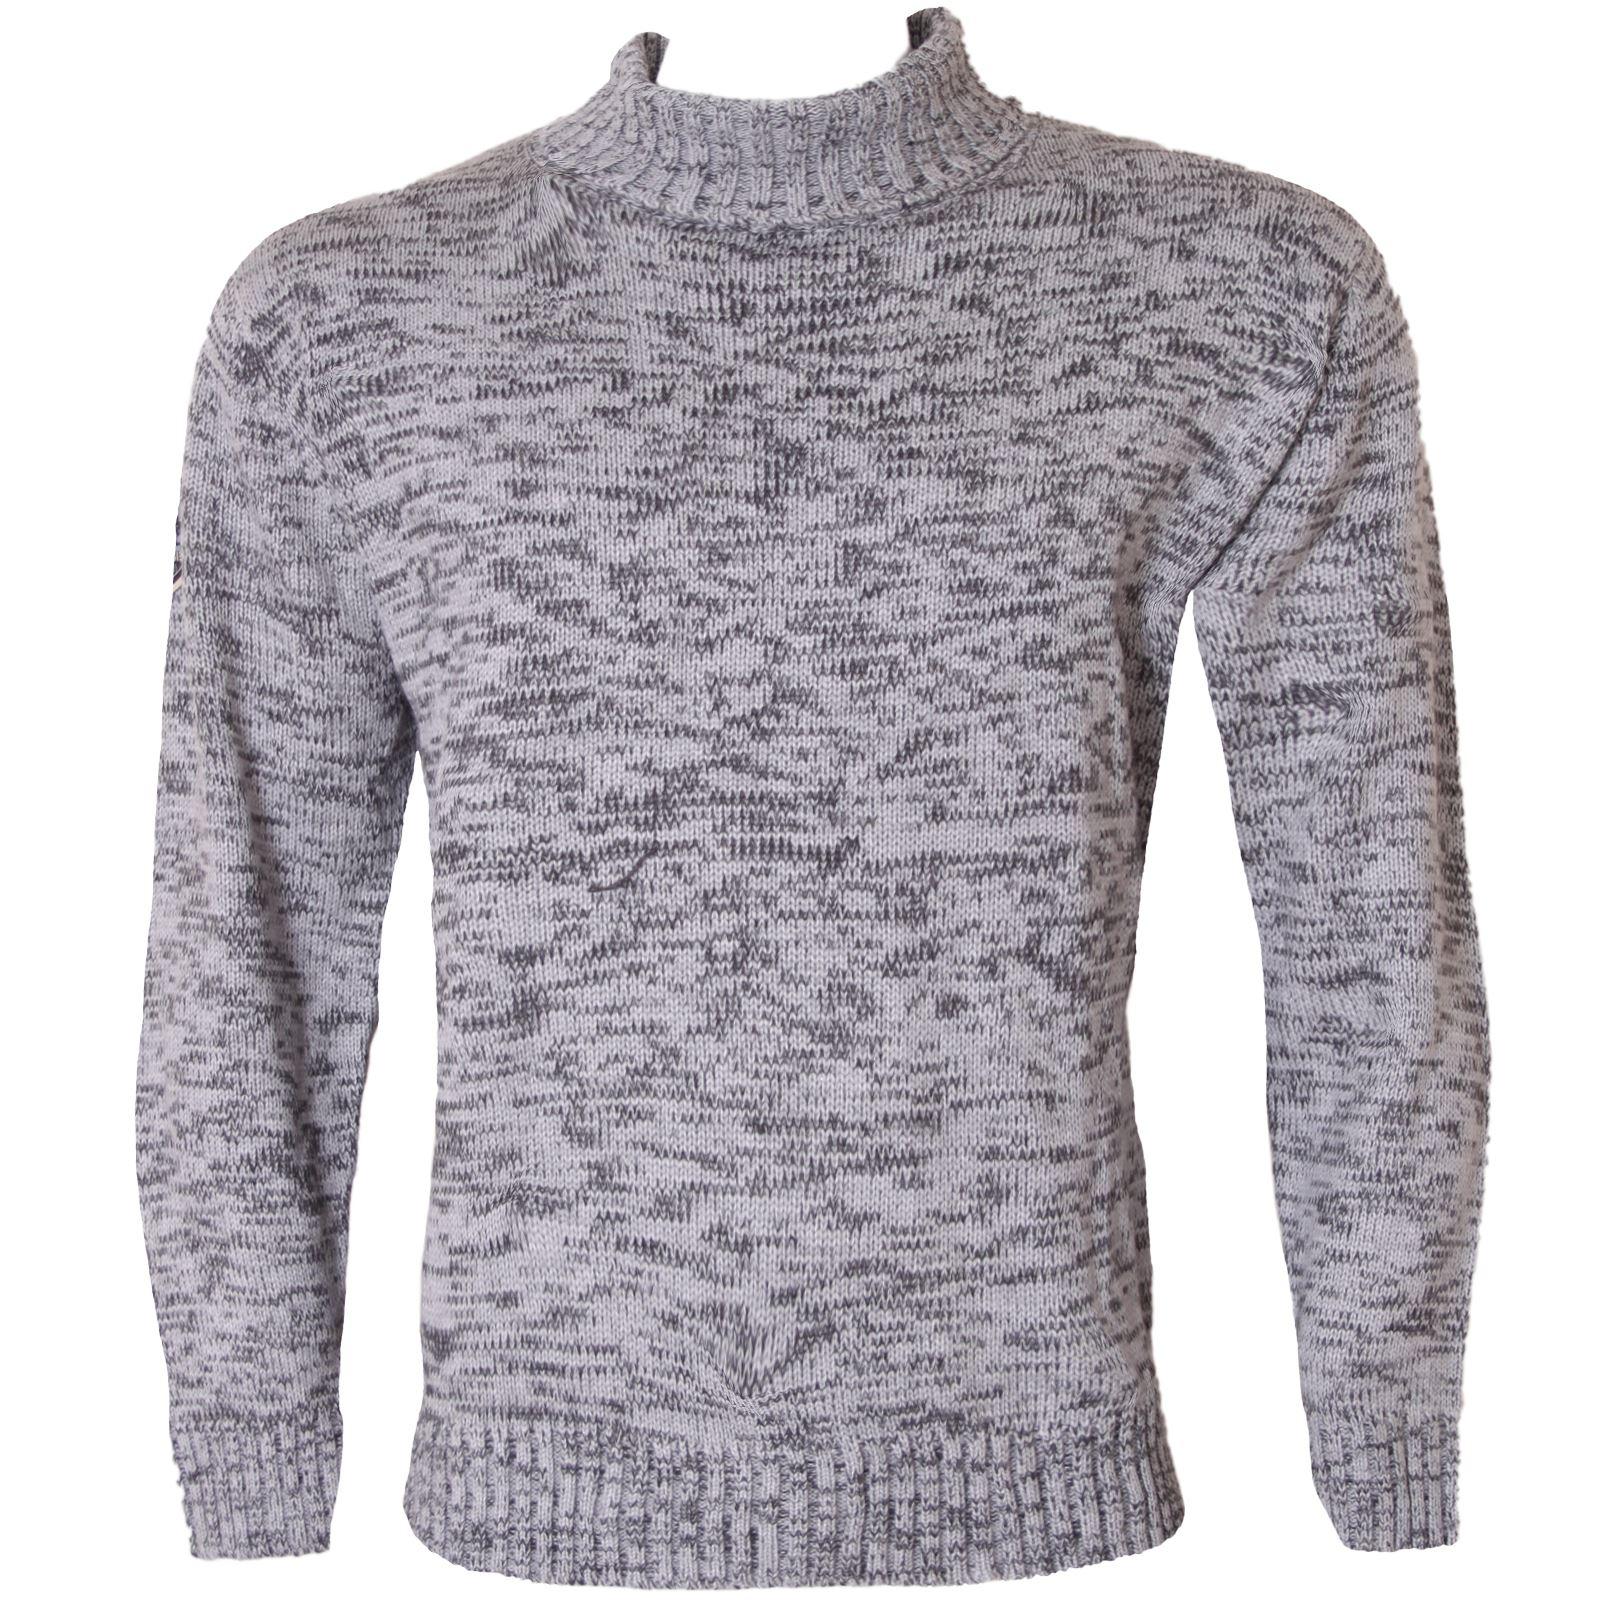 Shawl collar sweater mens knitting pattern most popular sweater 2017 mens knitting pattern cardigan sweater shawl collar bankloansurffo Choice Image